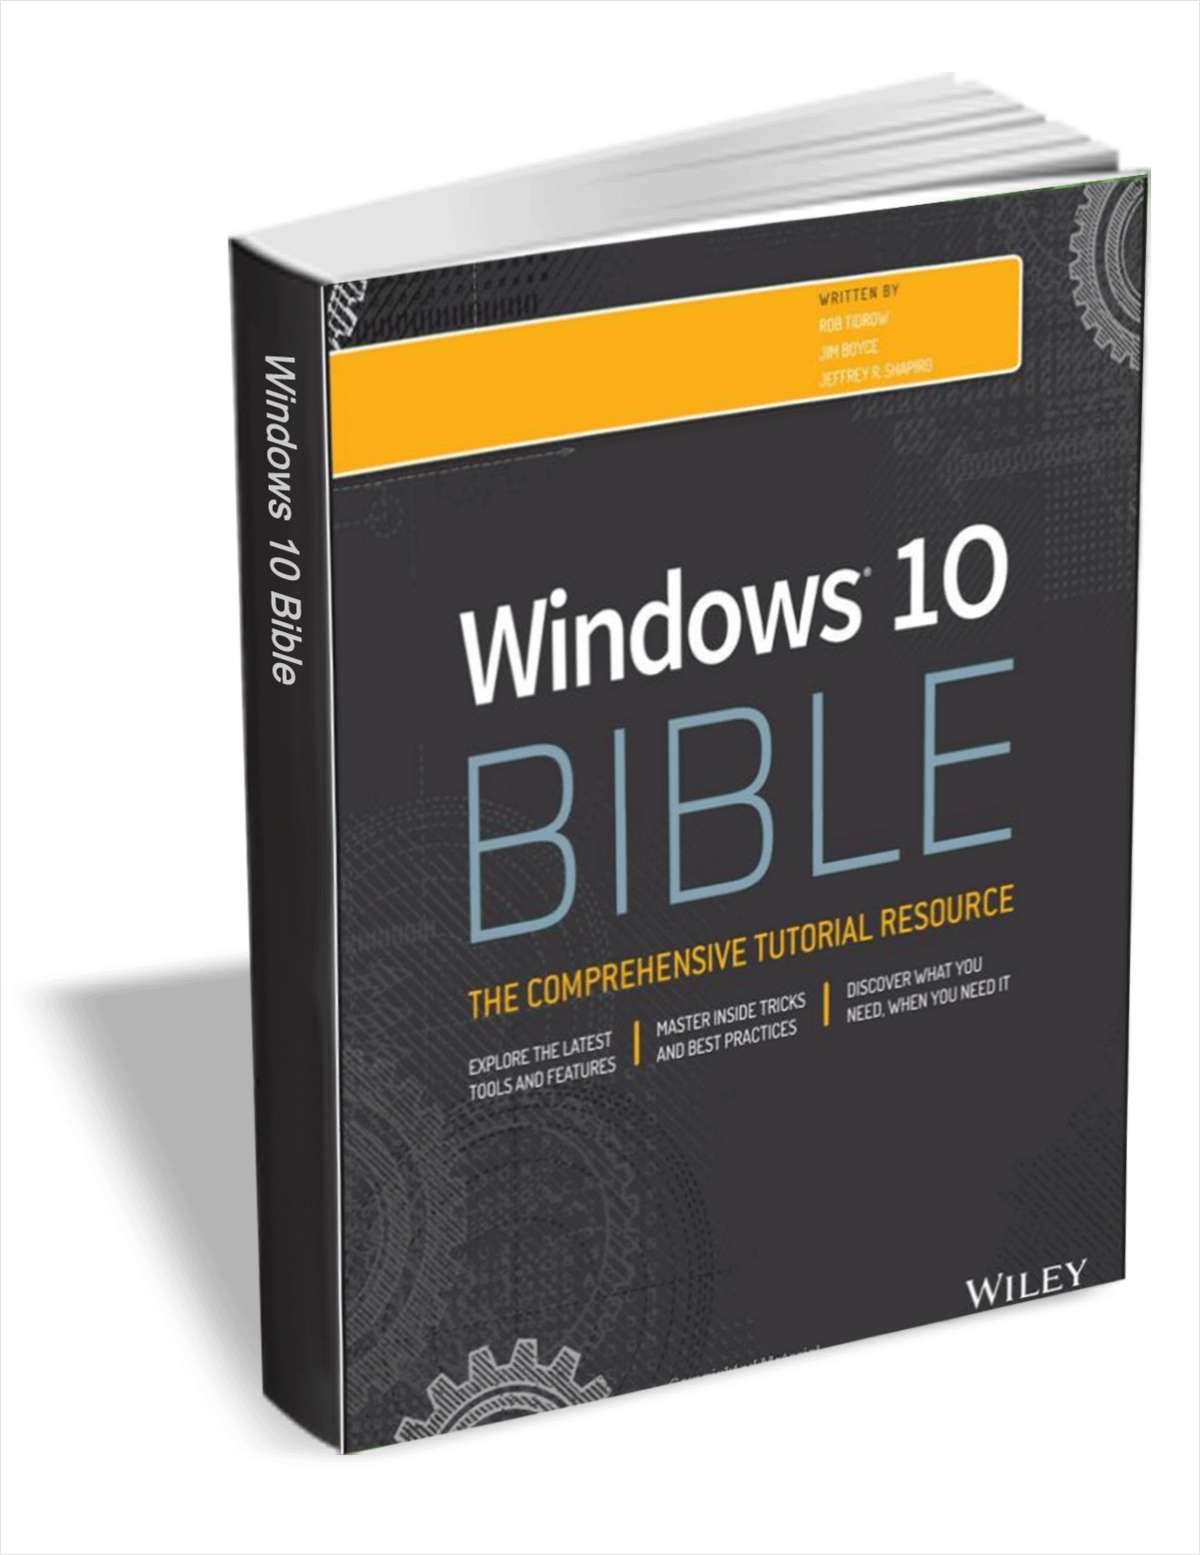 Windows 10 Bible (FREE eBook!) A $32.99 Value